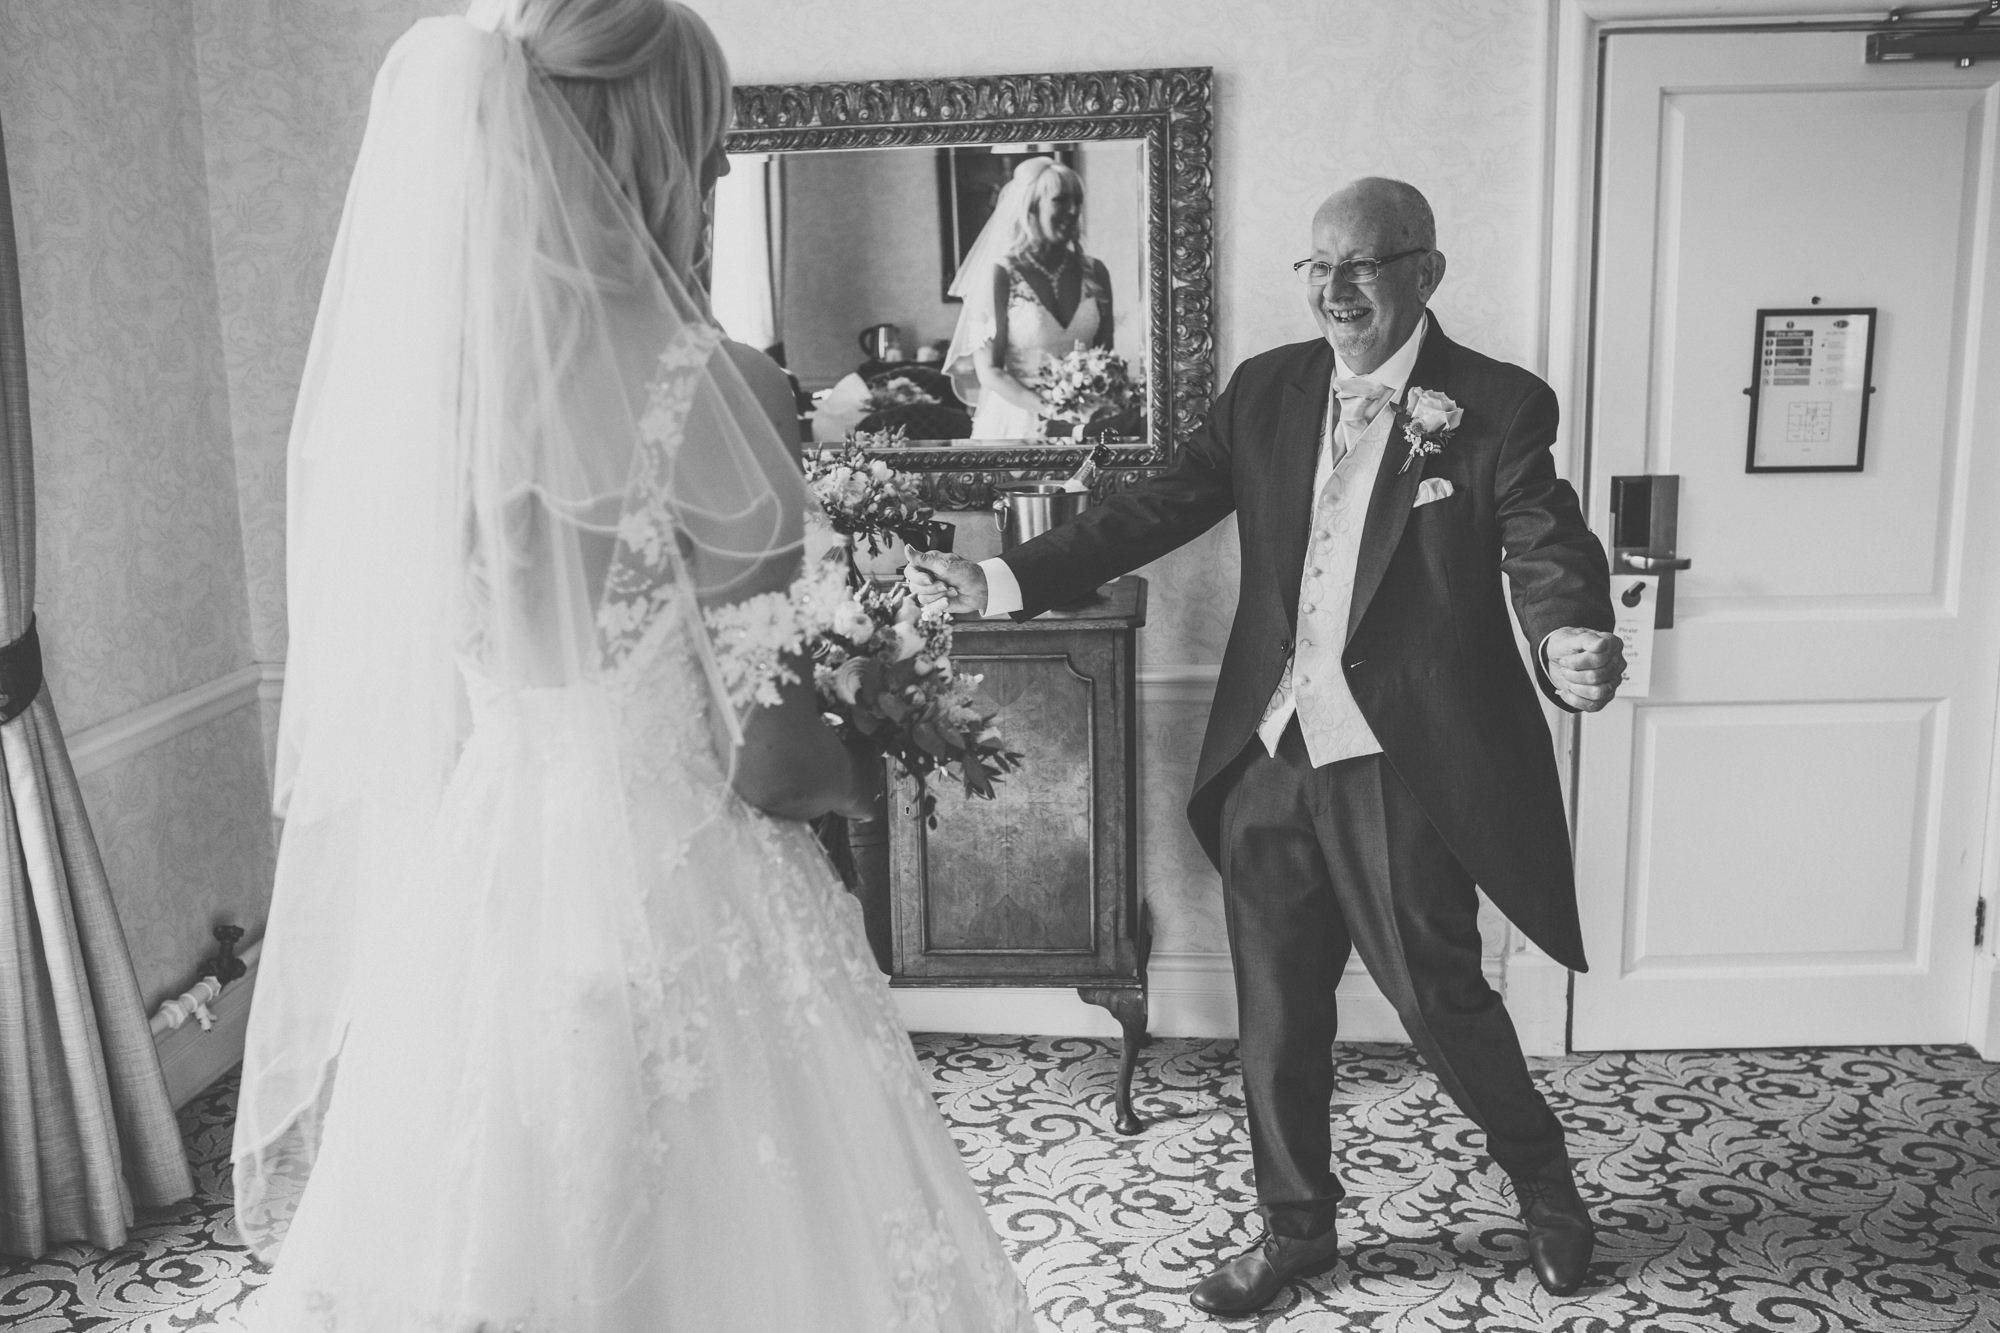 hellaby hall wedding photographers in rotherham, yorkshire-29.jpg